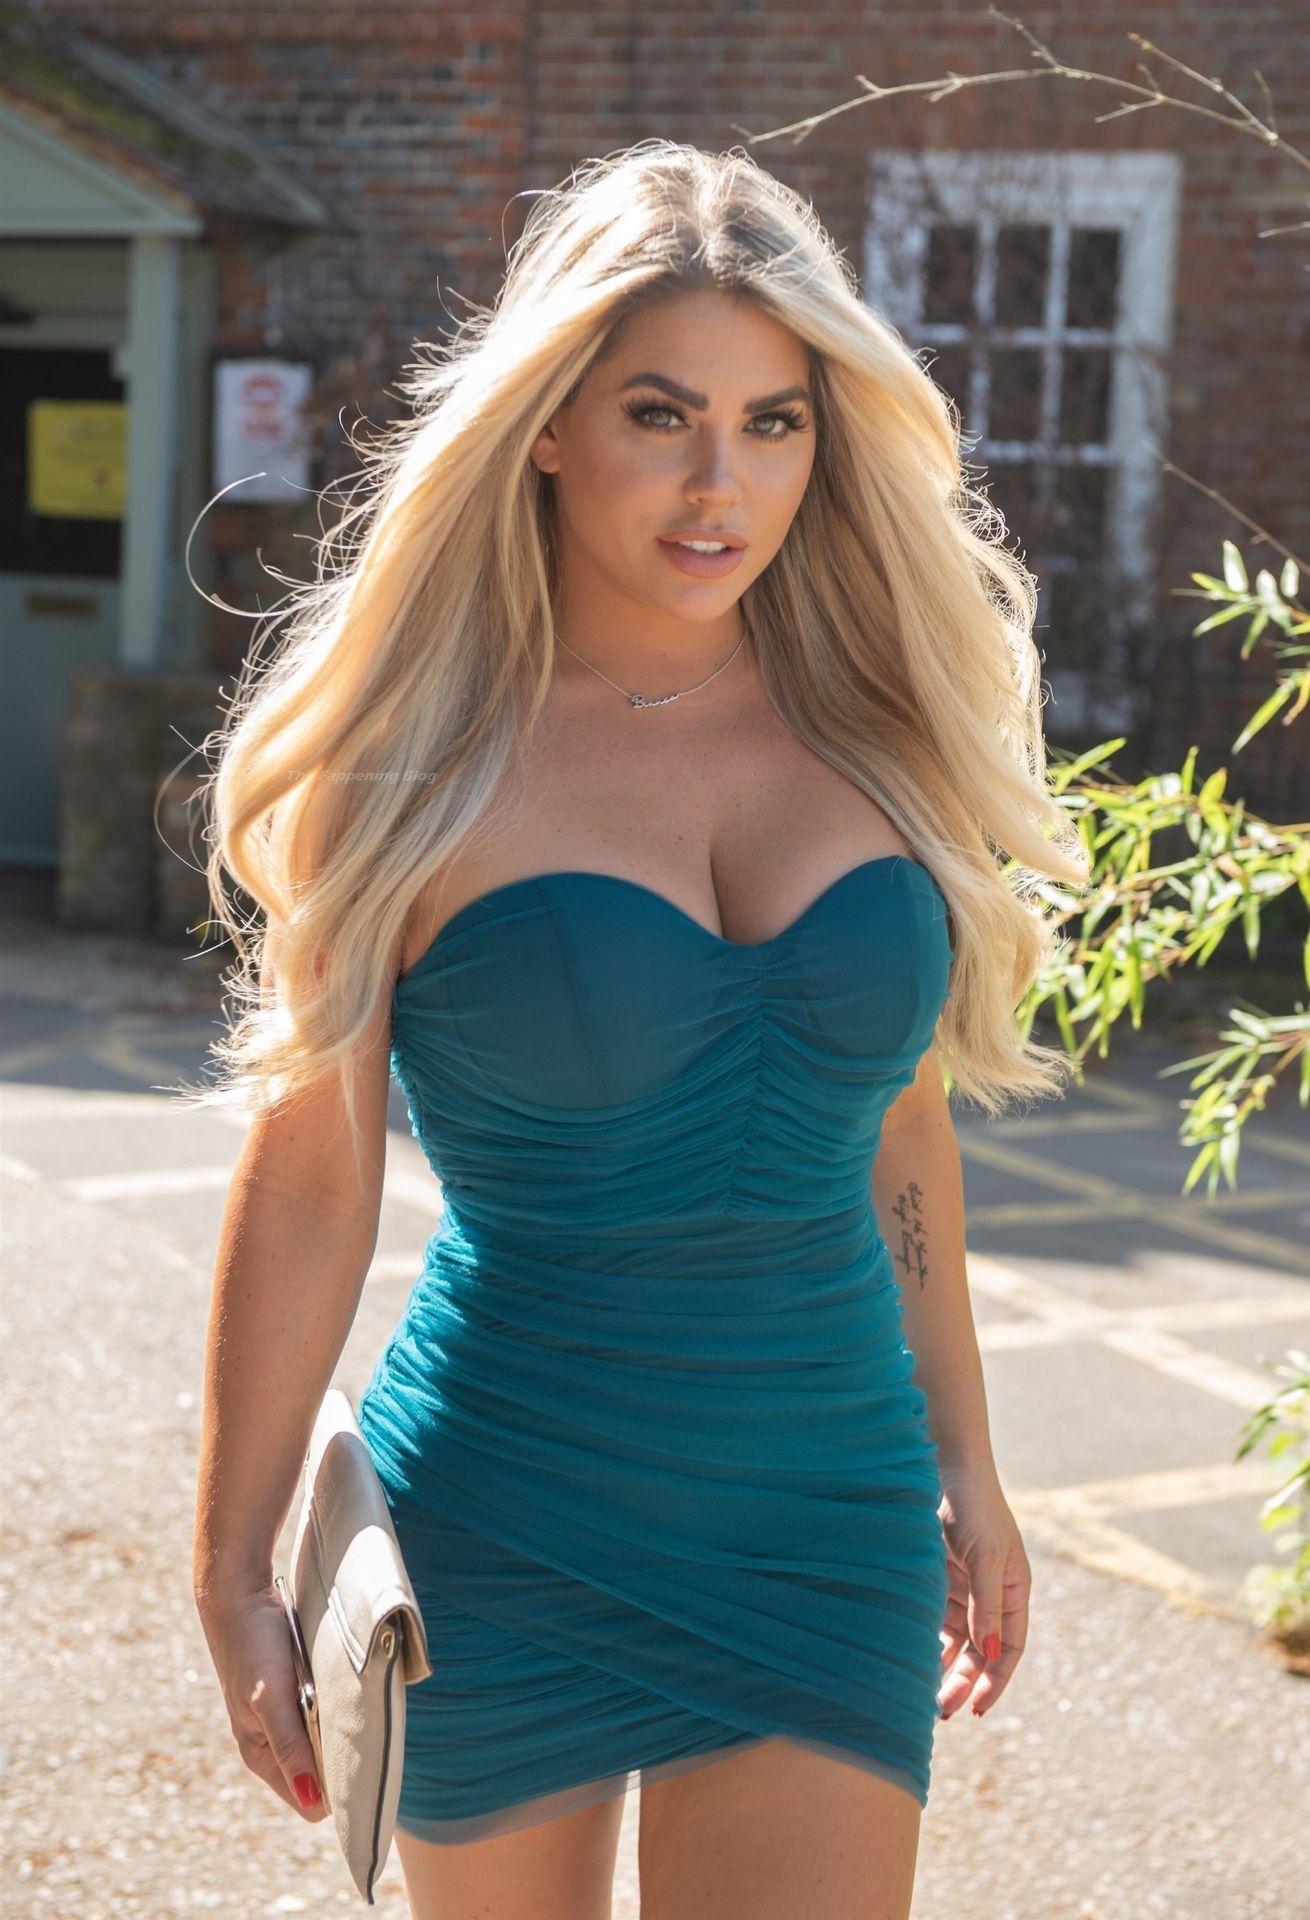 Bianca-Gascoigne-Sexy-The-Fappening-Blog-9.jpg